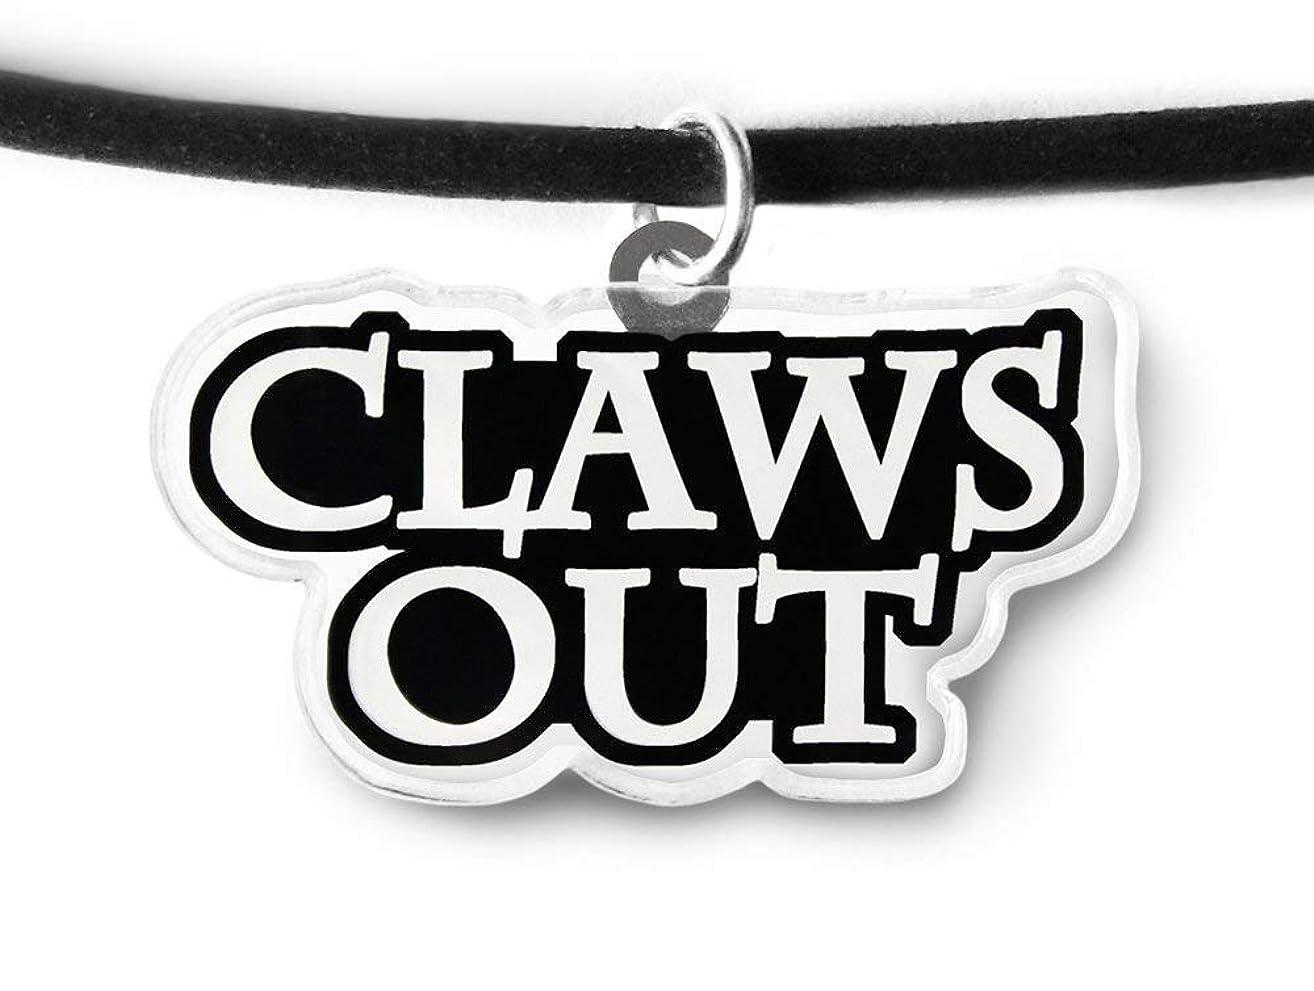 Claws Out Charm Choker - Punk Rock, Aesthetic, Goth Choker, Pastel Goth, Soft Grunge, Punk Rock Fashion